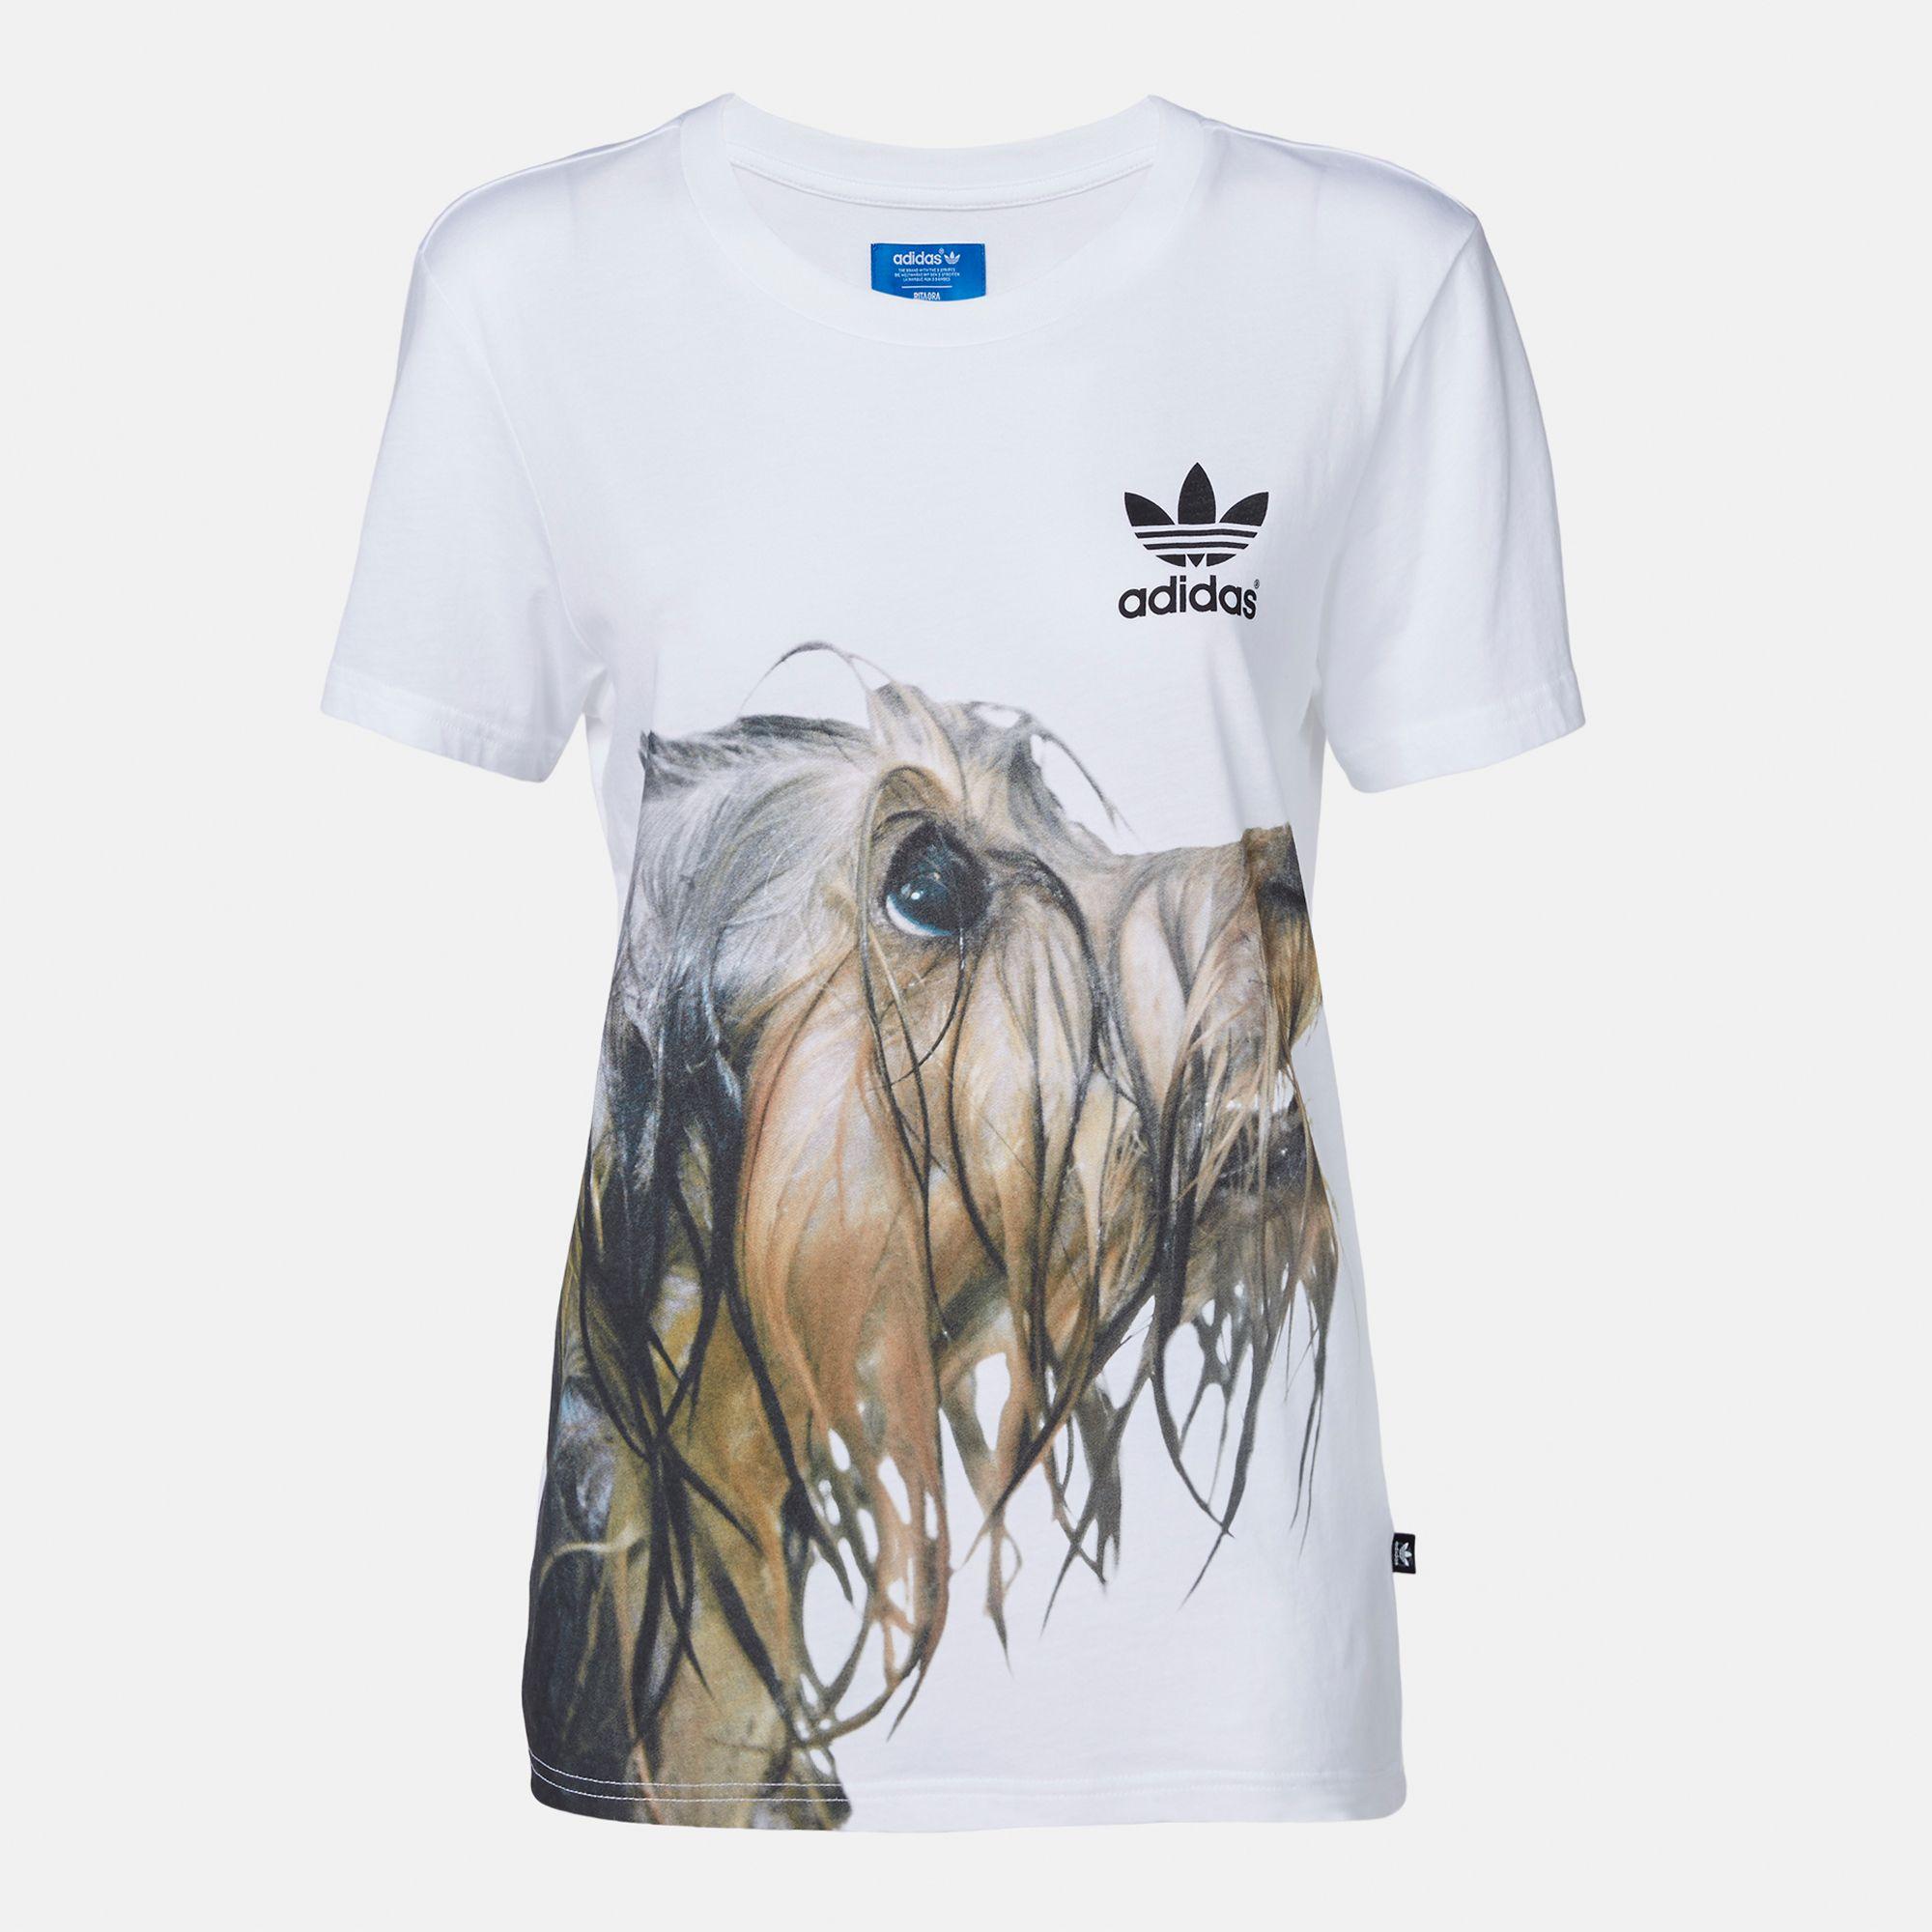 384873438 Shop White adidas Rita Ora Dog Print T-Shirt for Womens by adidas ...